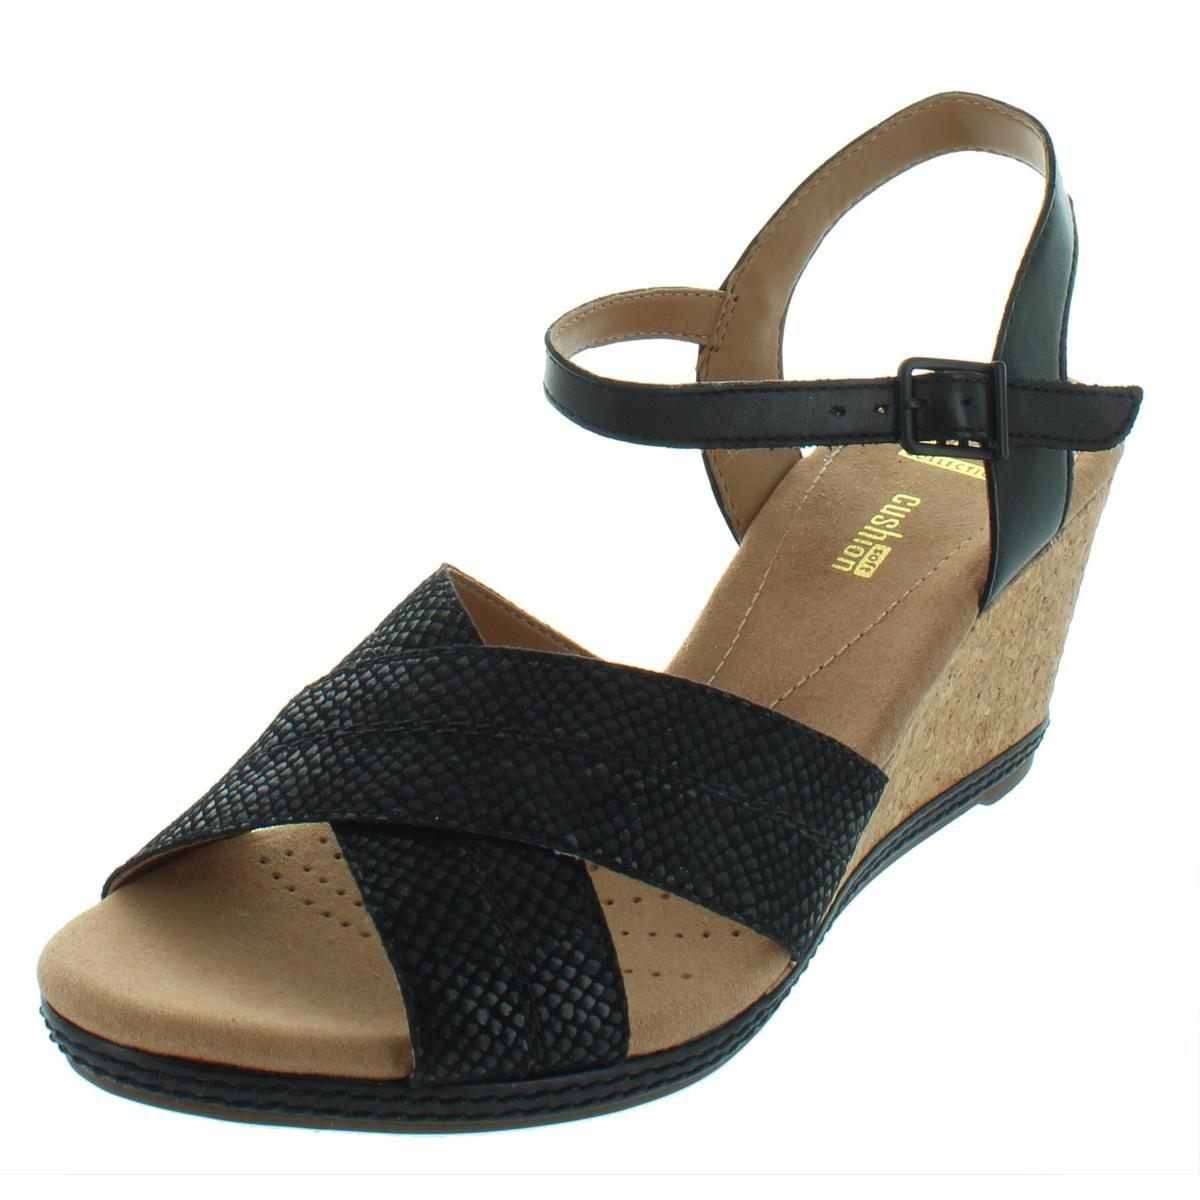 b31c14fc5 Lyst - Clarks Womens Latitude Suede Snake Pattern Wedge Heels in Black